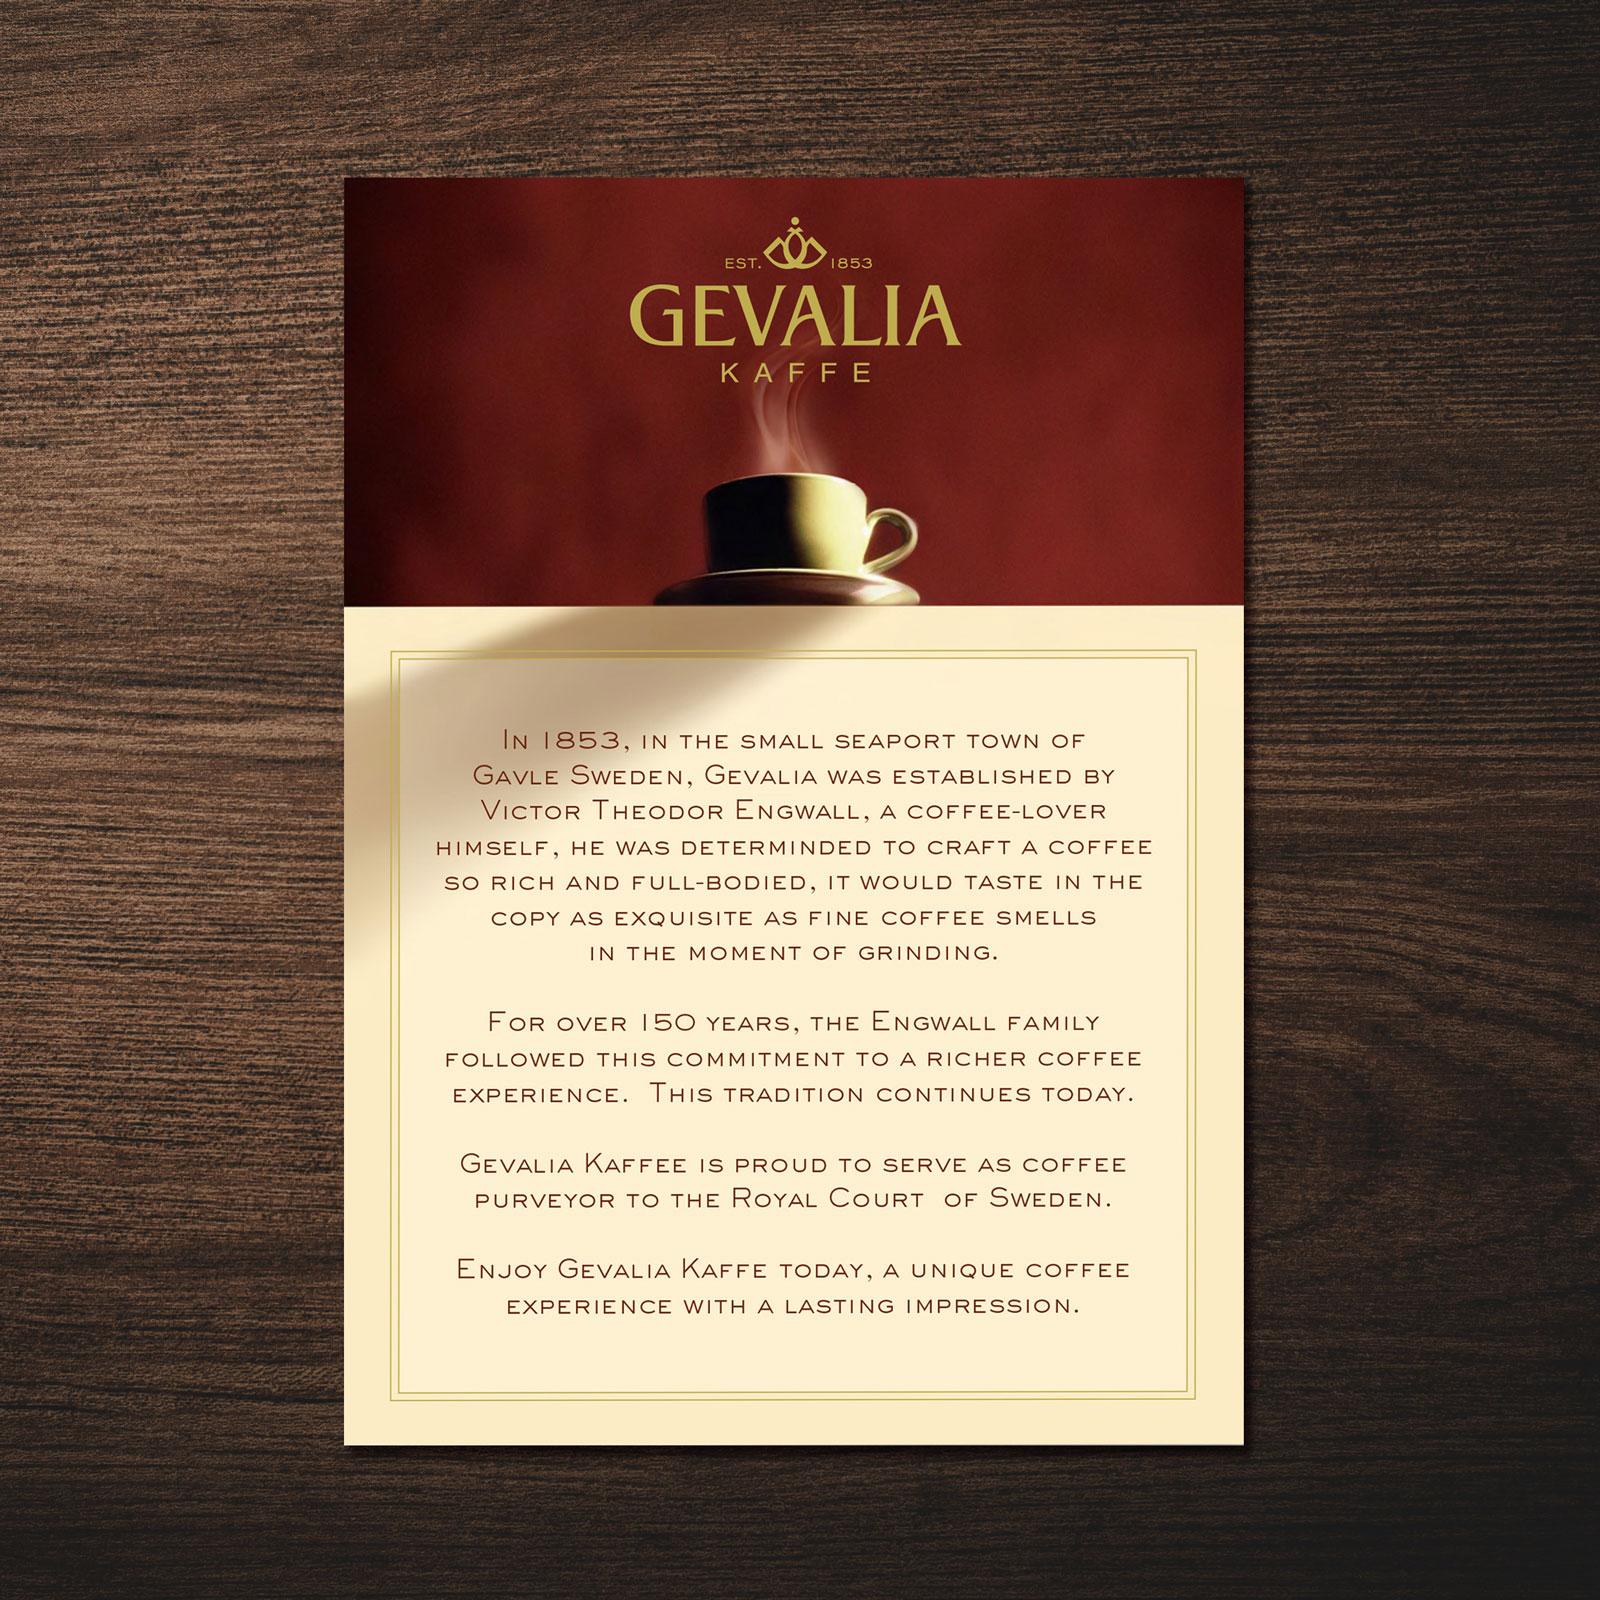 Coffee Brand Identity – Gevalia